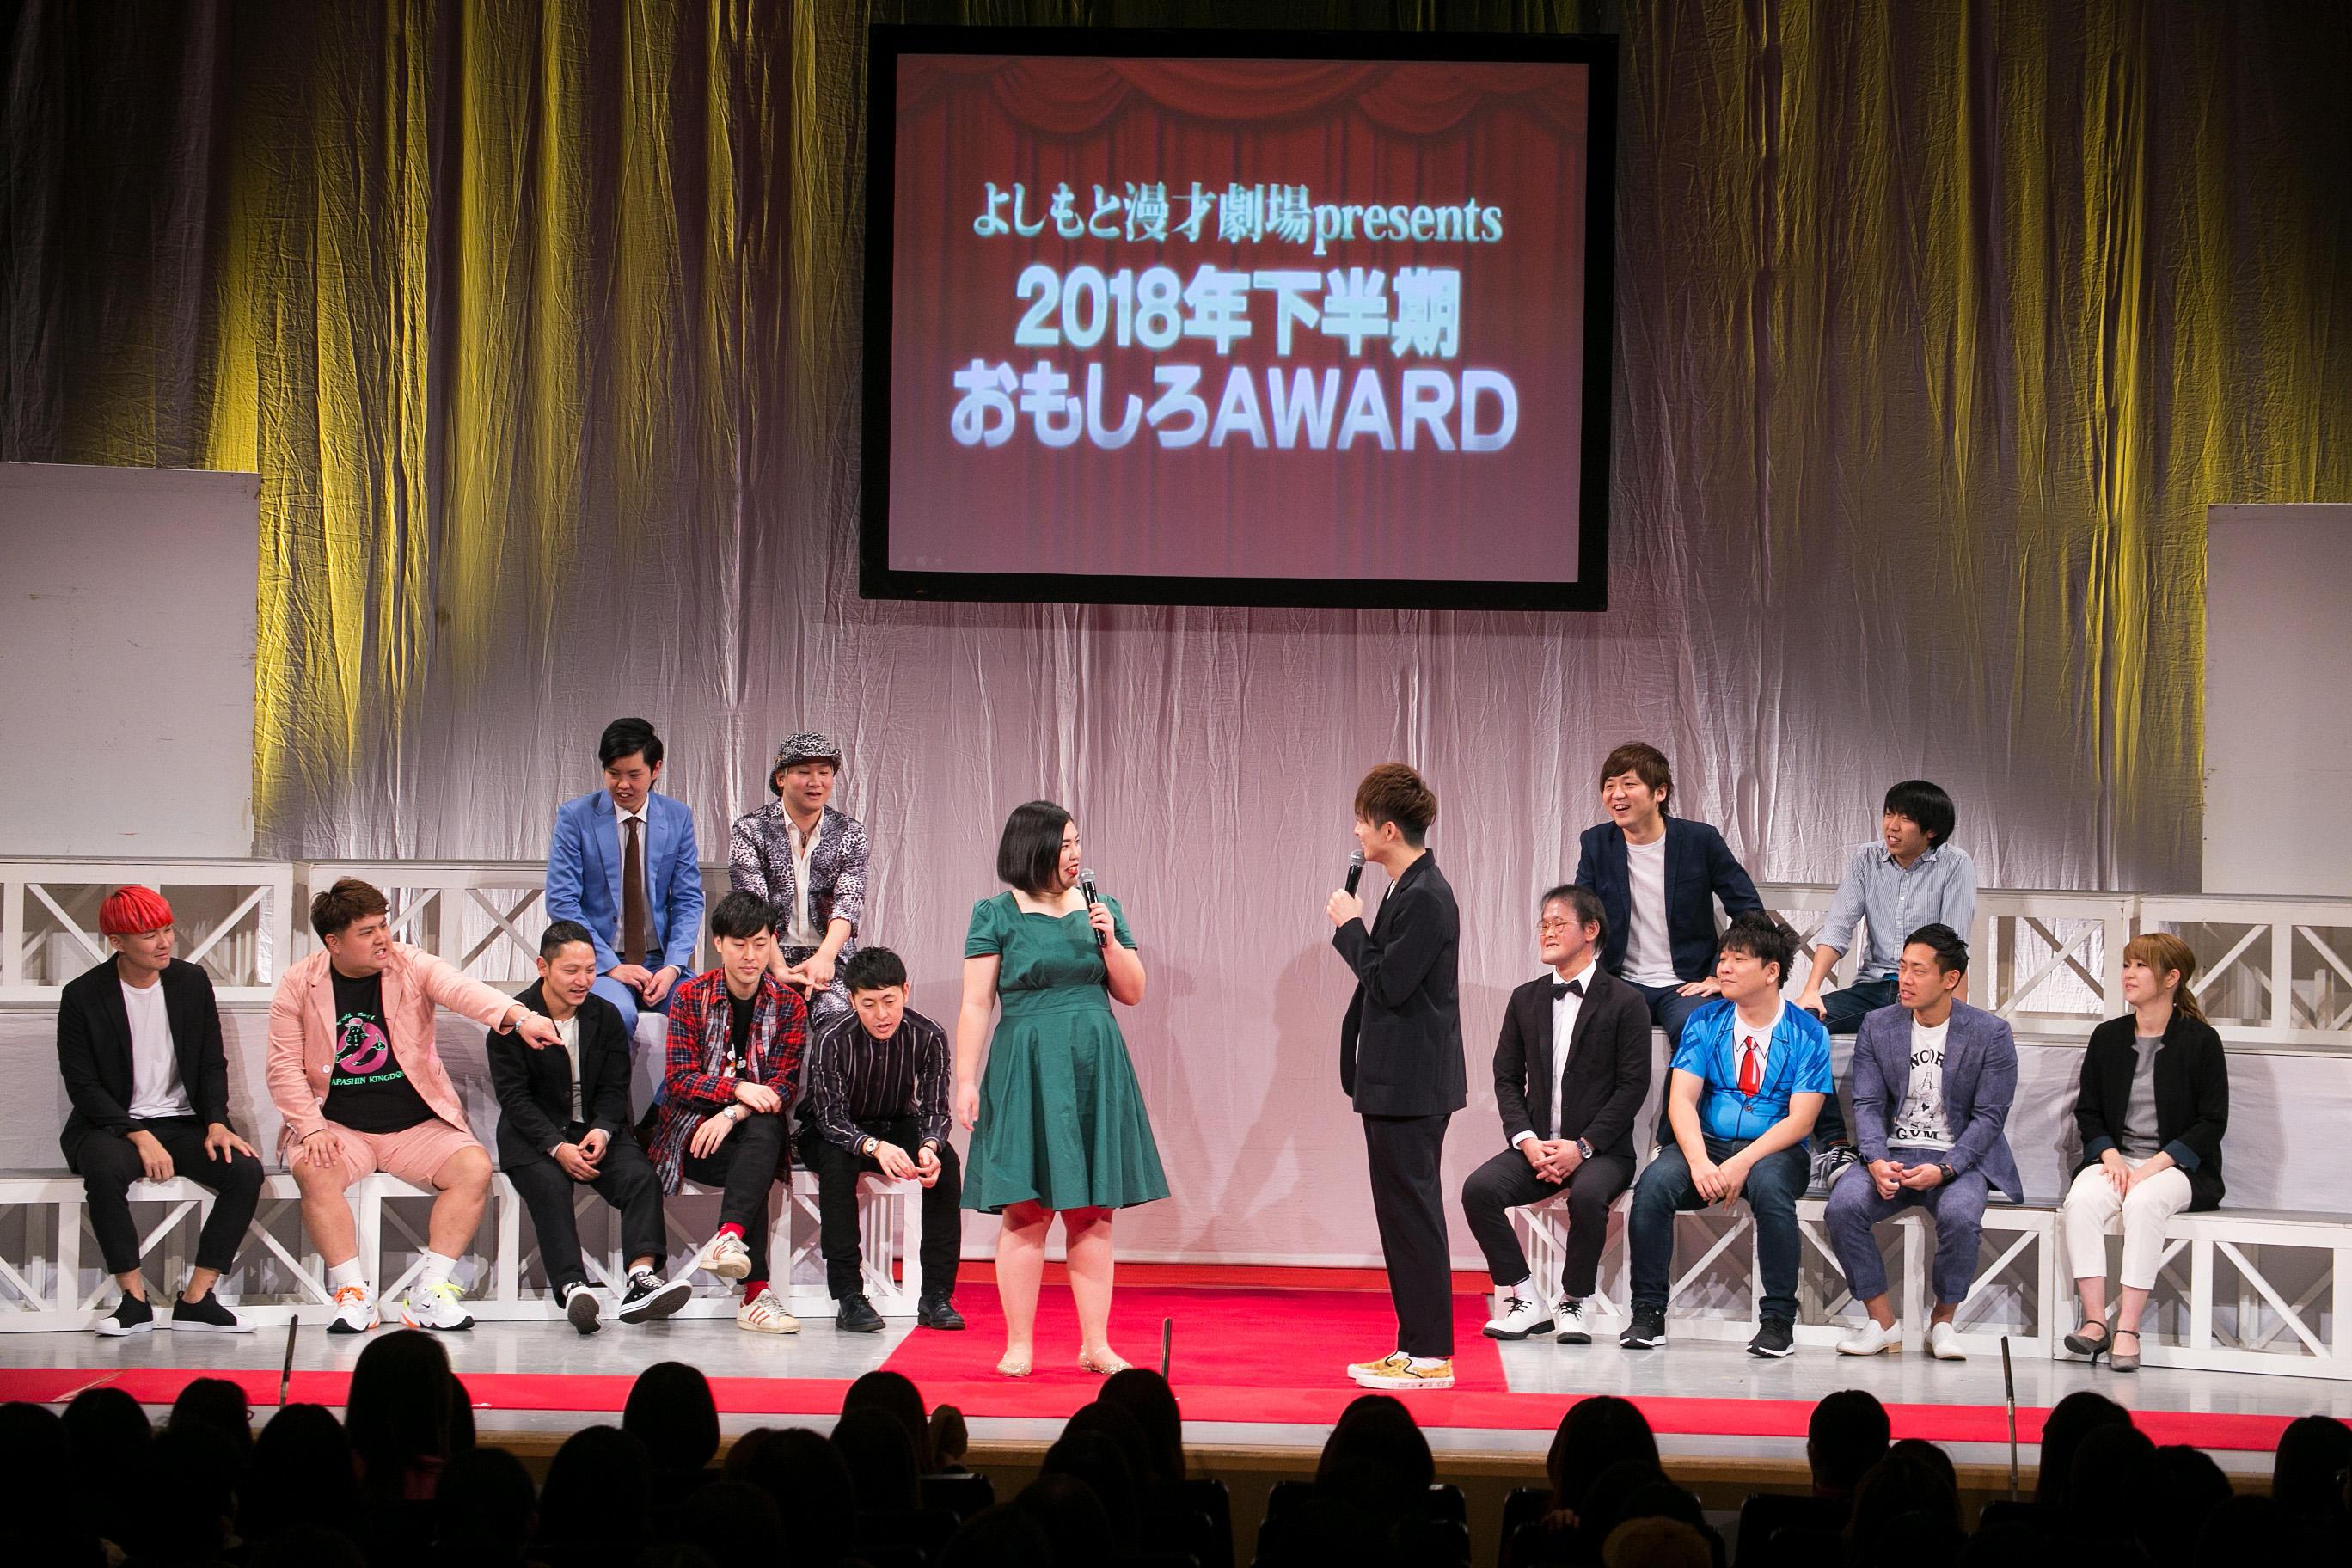 http://news.yoshimoto.co.jp/20181228111025-4526403e1db726ed52ad6e8b99956f14ce7d5ce2.jpg